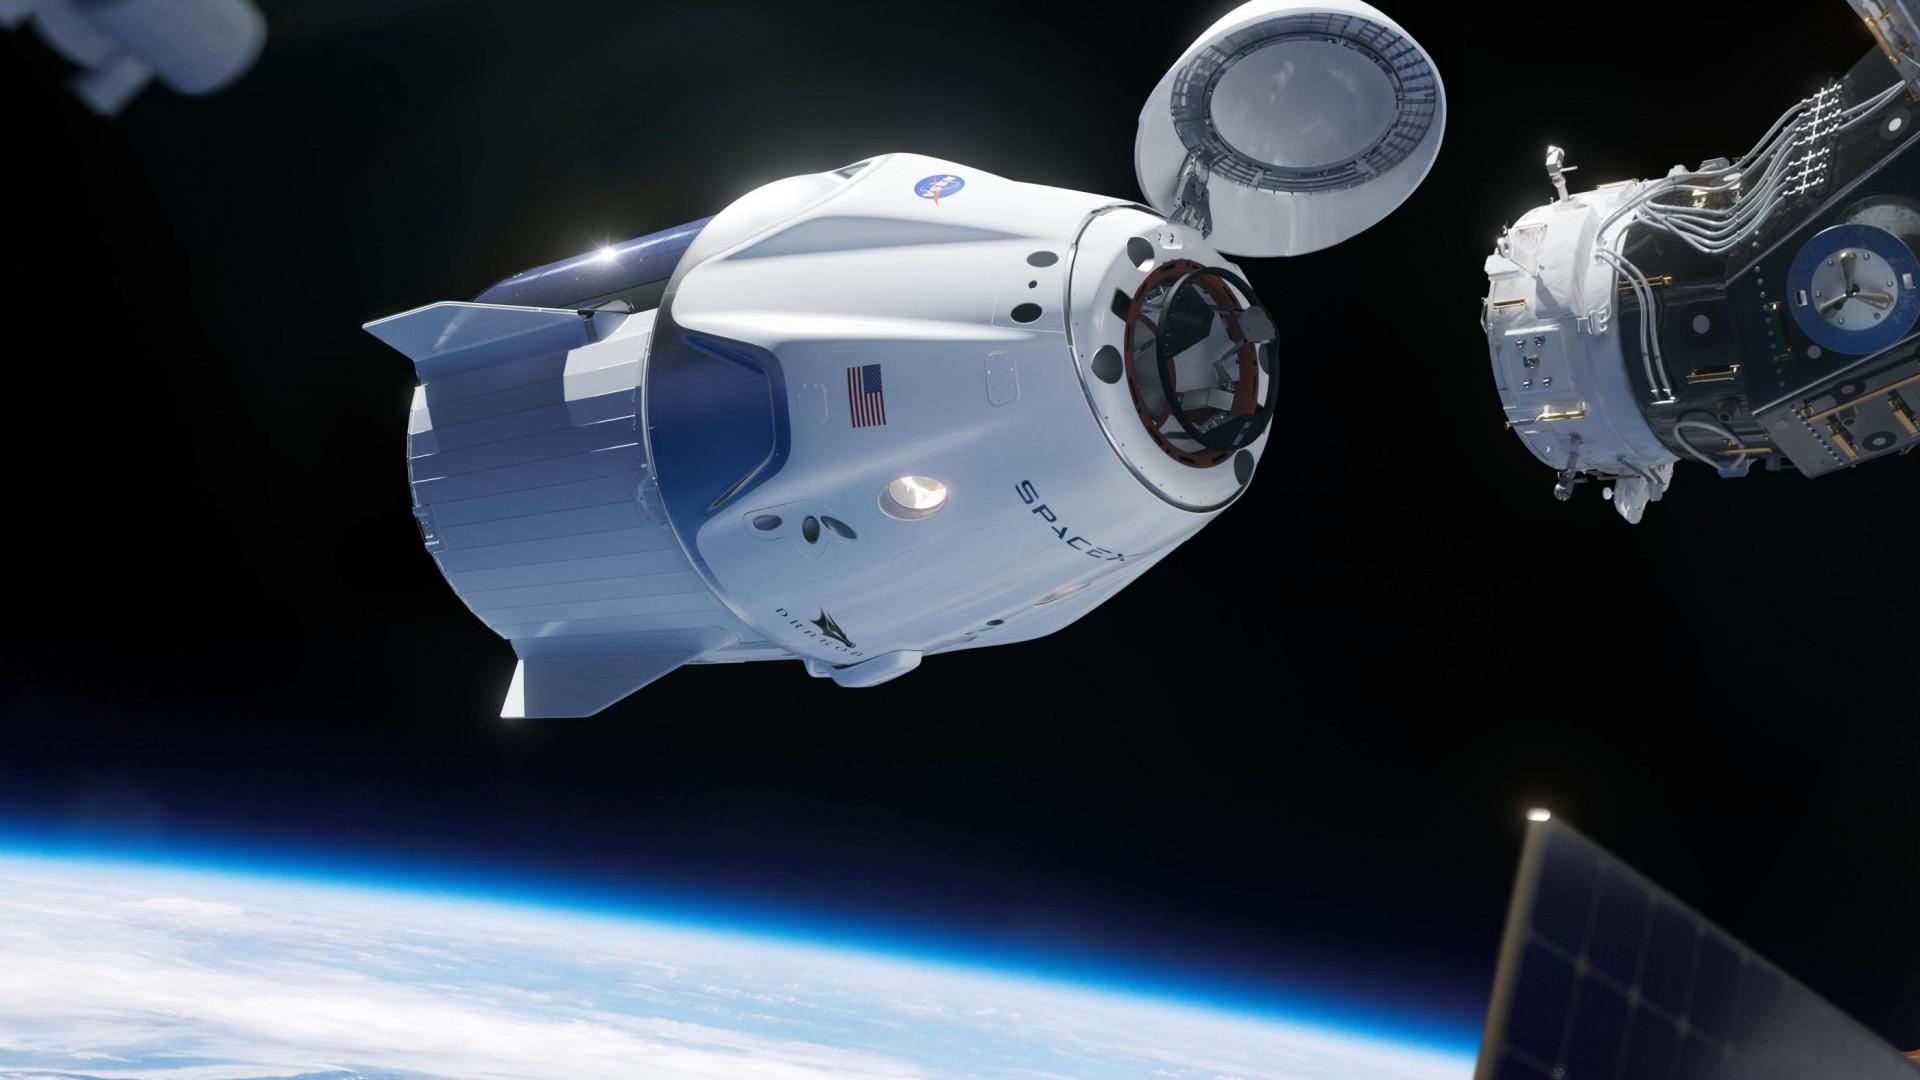 SpaceX planeja primeiro voo tripulado para maio